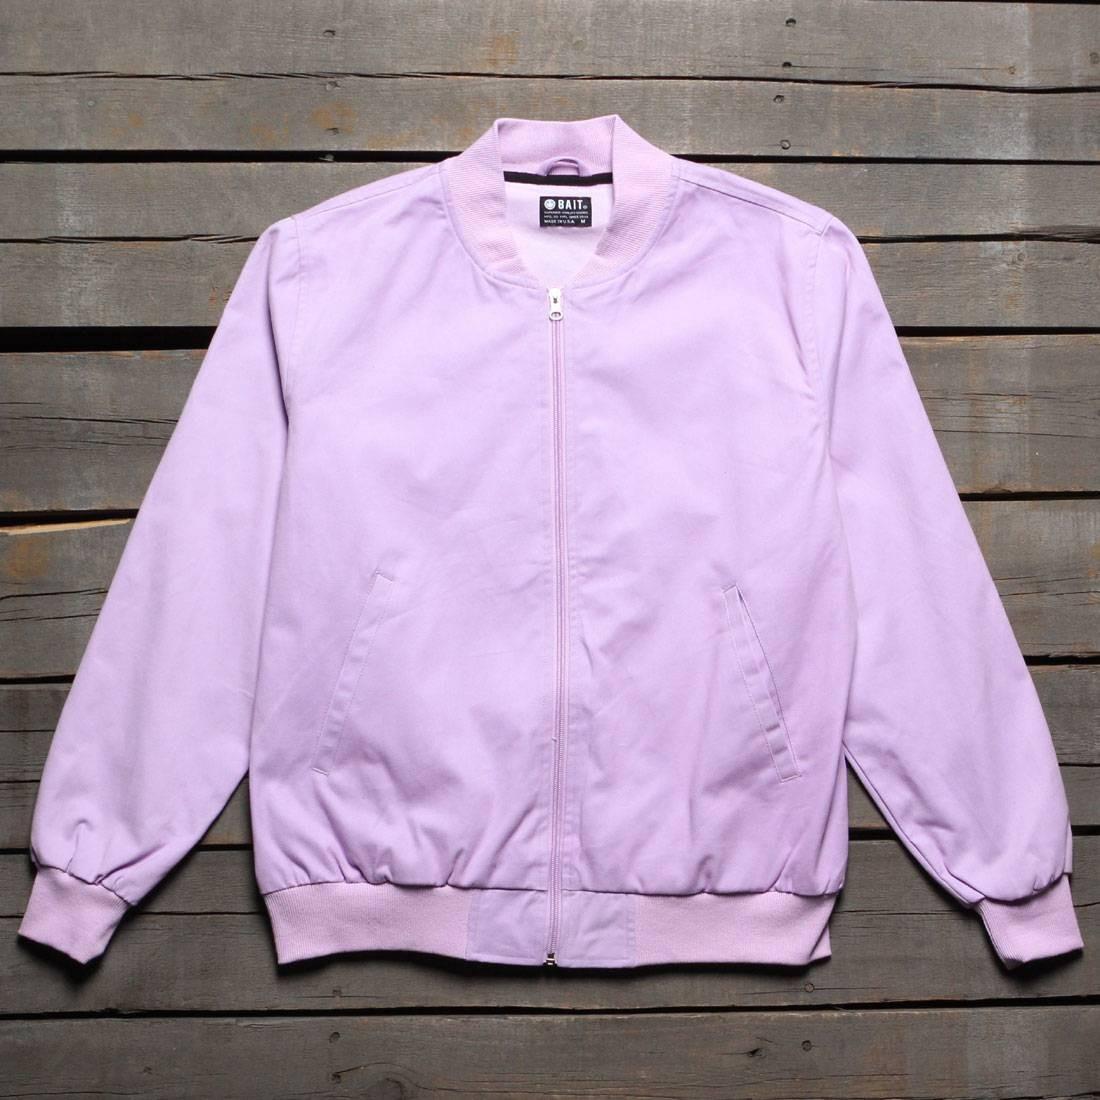 BAIT Men Canvas Jacket - Made In LA (purple / lavender)